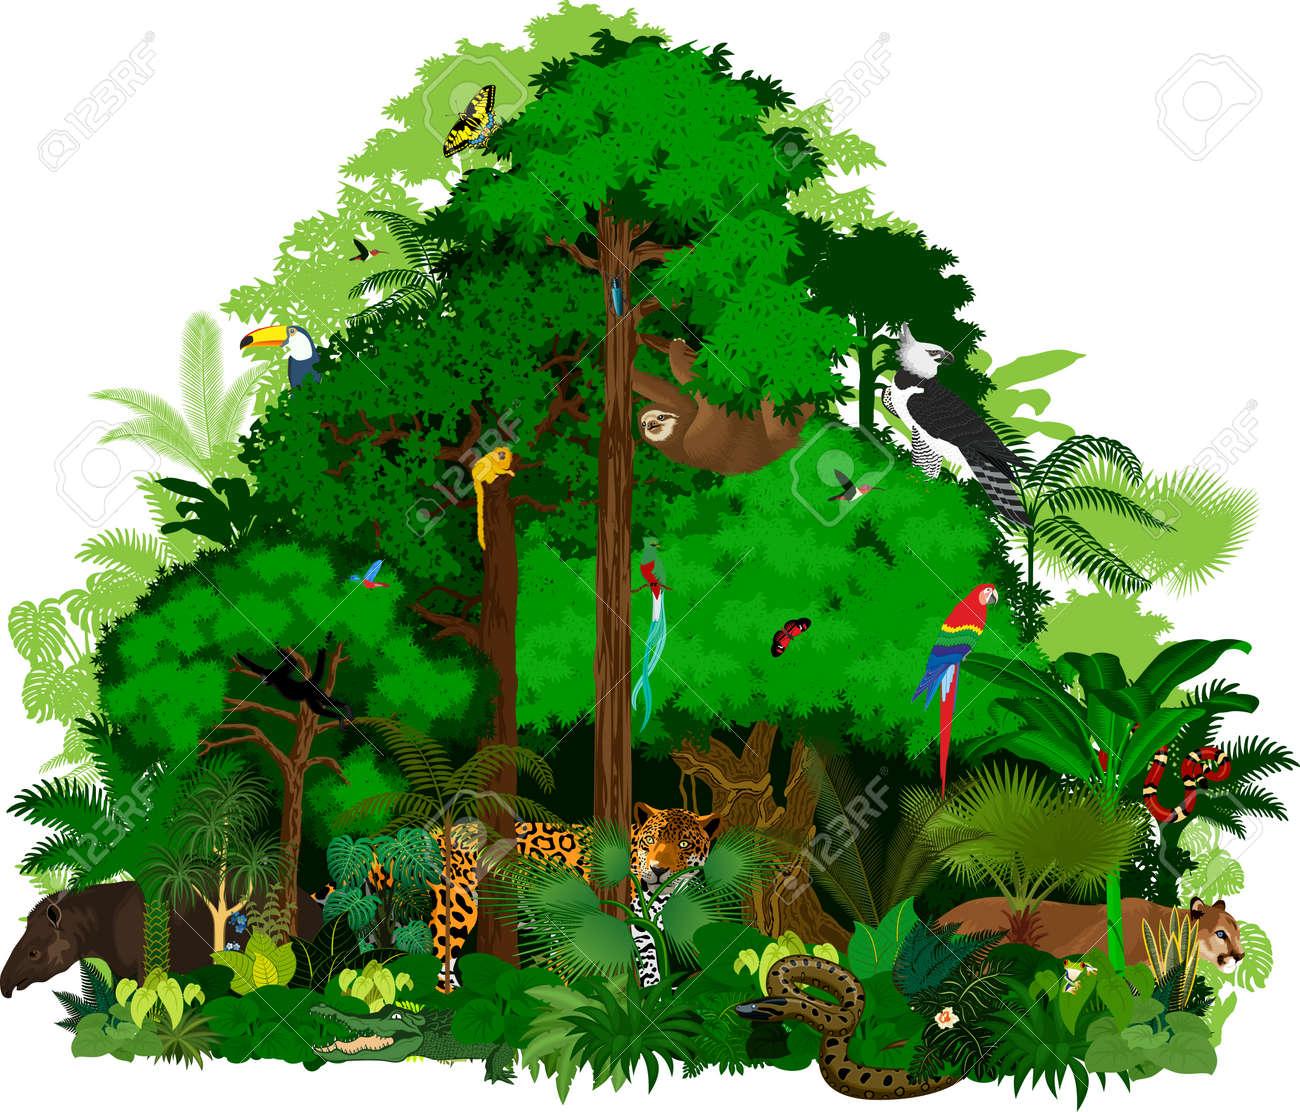 rainforest illustration green tropical forest jungle royalty free rh 123rf com  tropical rainforest animals clipart